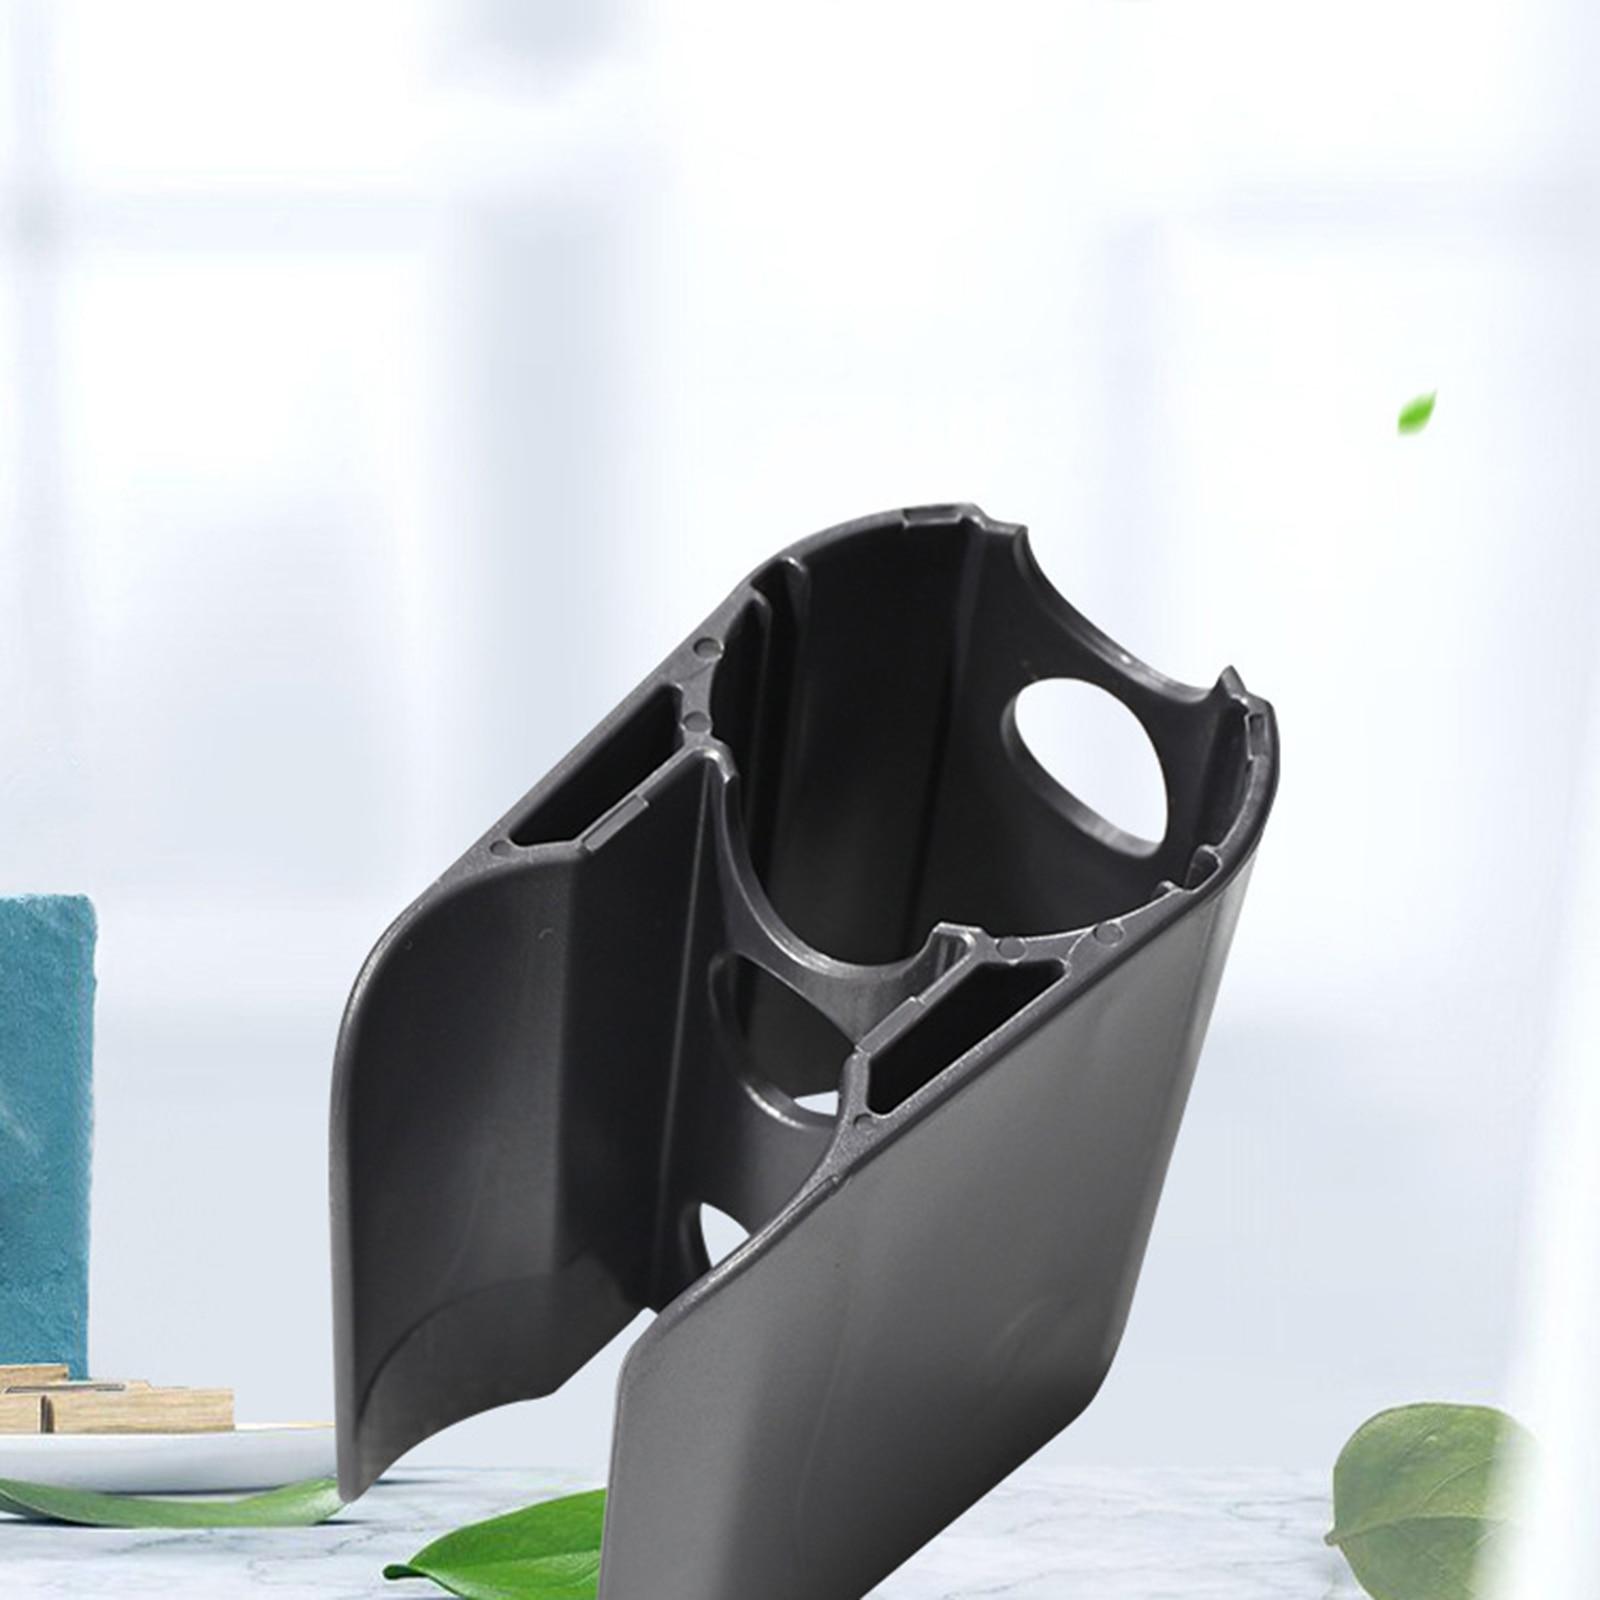 Attachment Clip Holder For Dyson V7 / V8 / V10 / V11 Vacuum Cleaner Parts Storage Rack